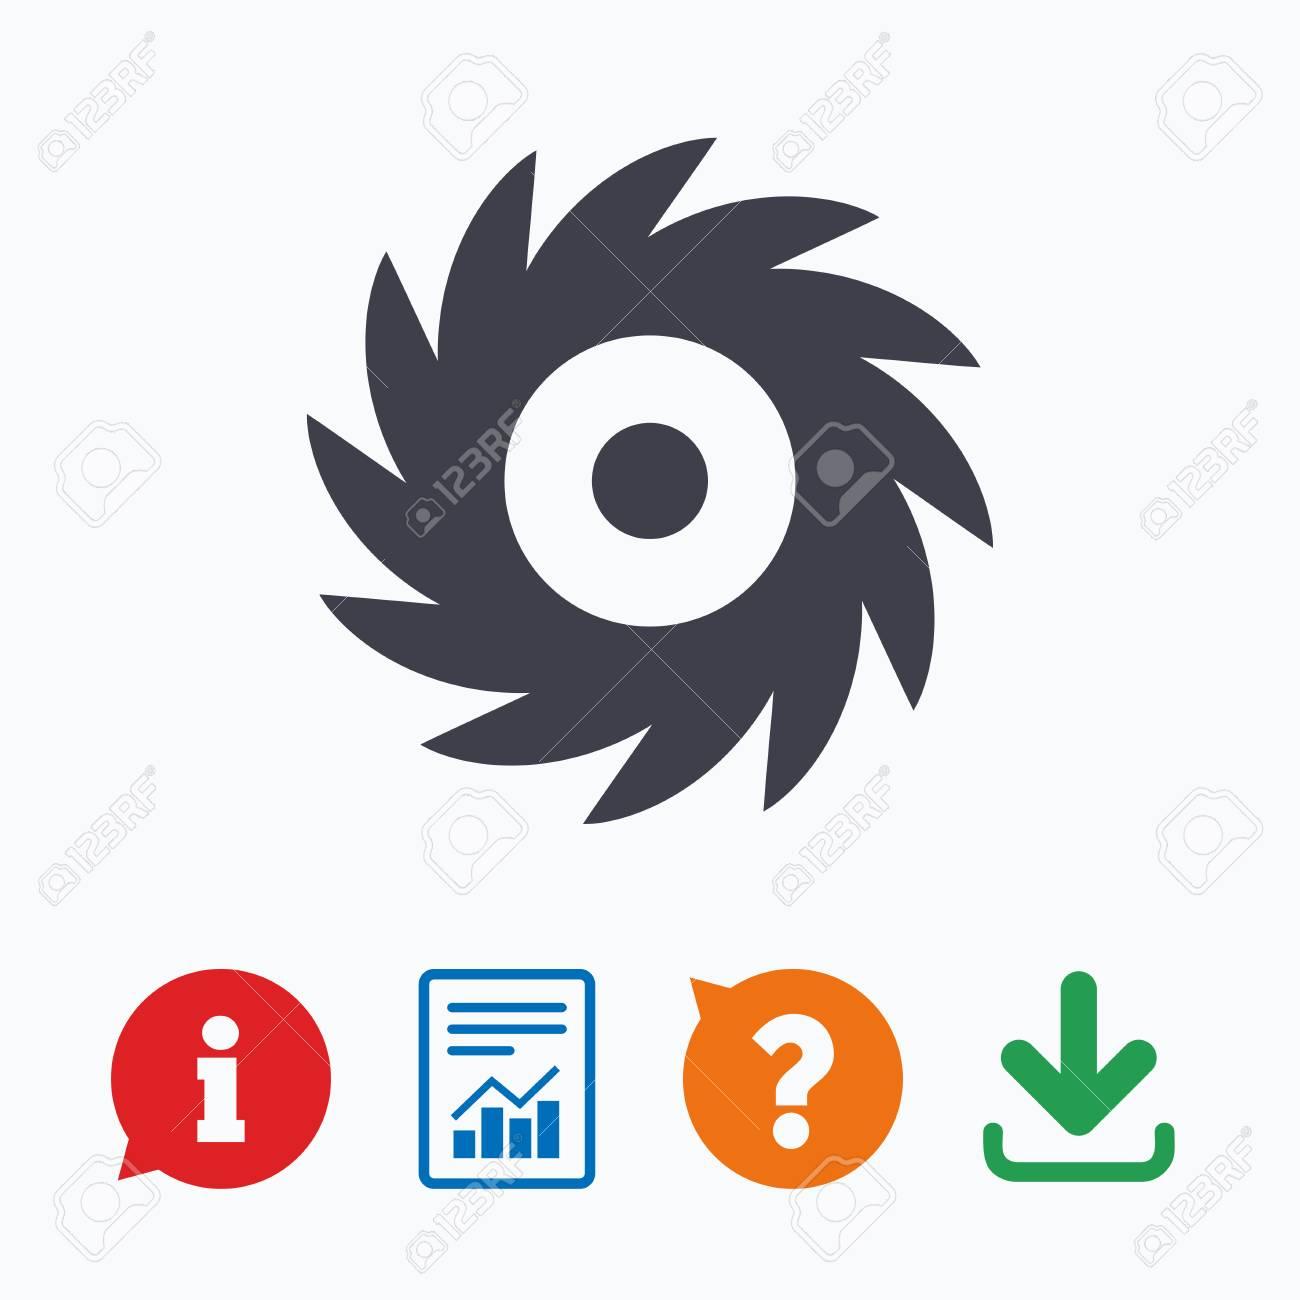 Saw circular wheel sign icon  Cutting blade symbol  Information